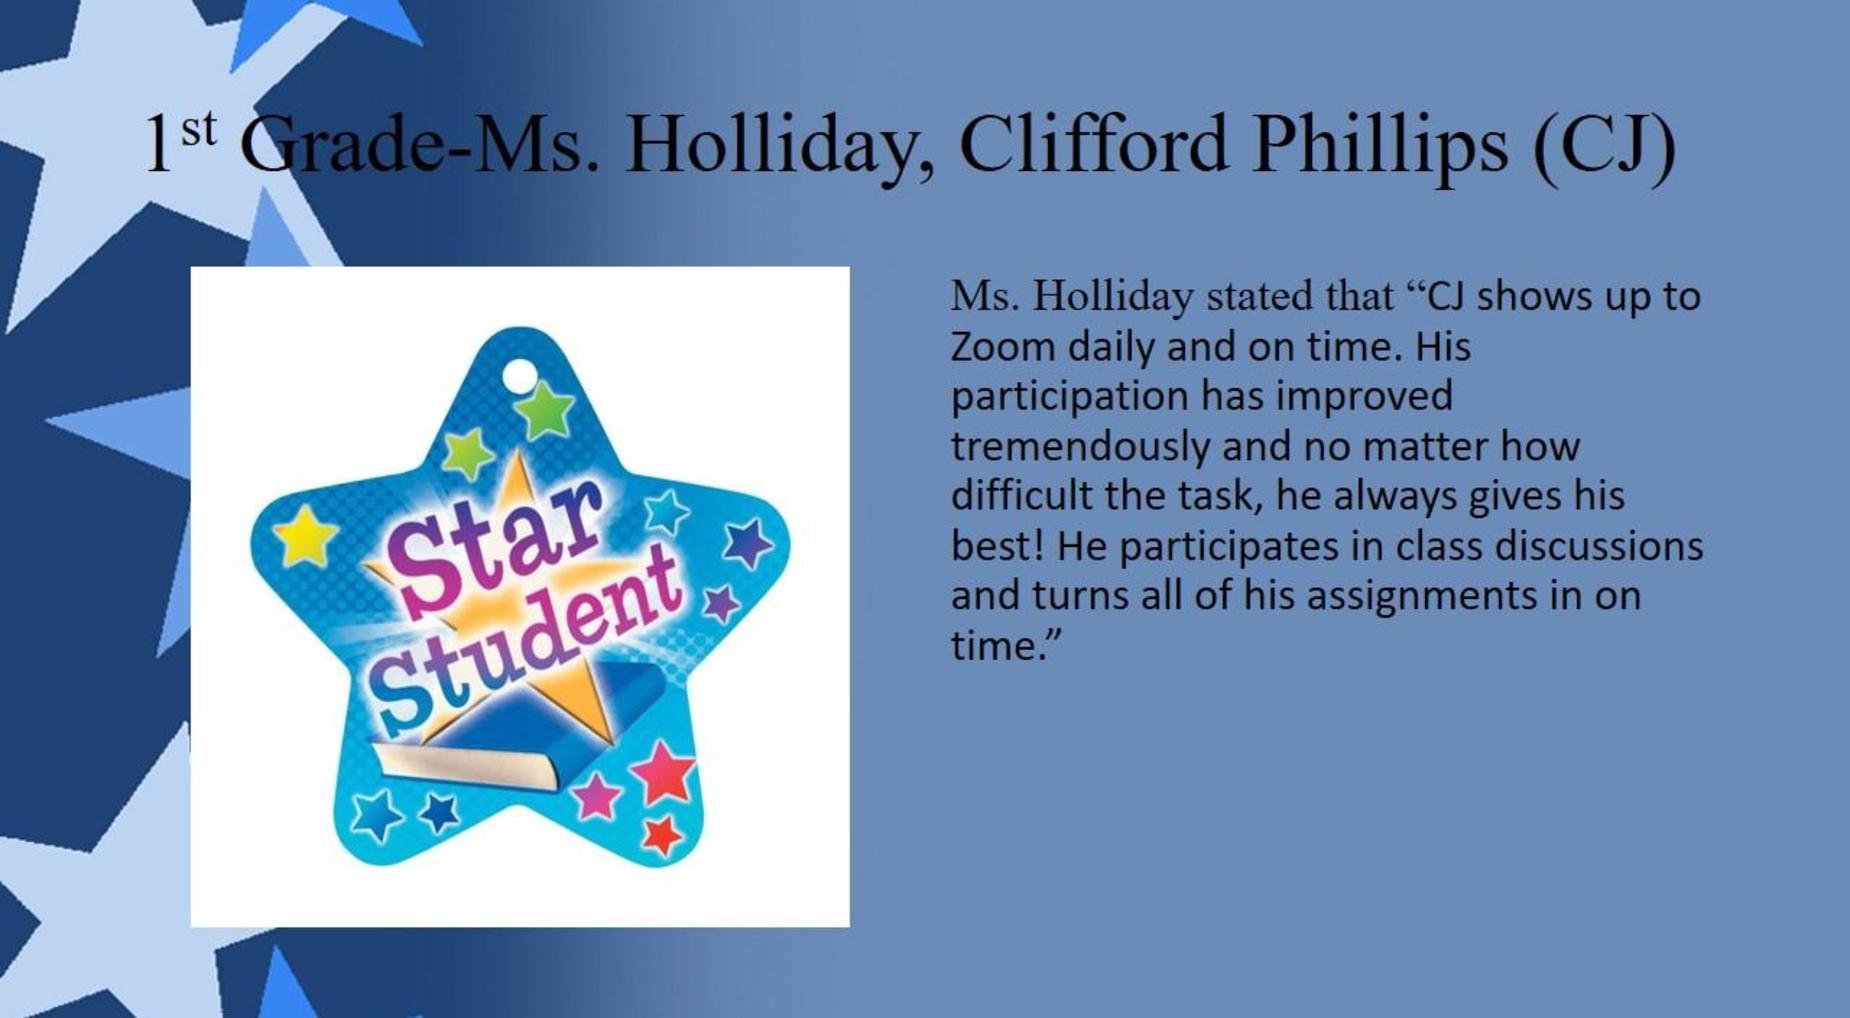 Clifford Phillips (CJ), 1st Grade